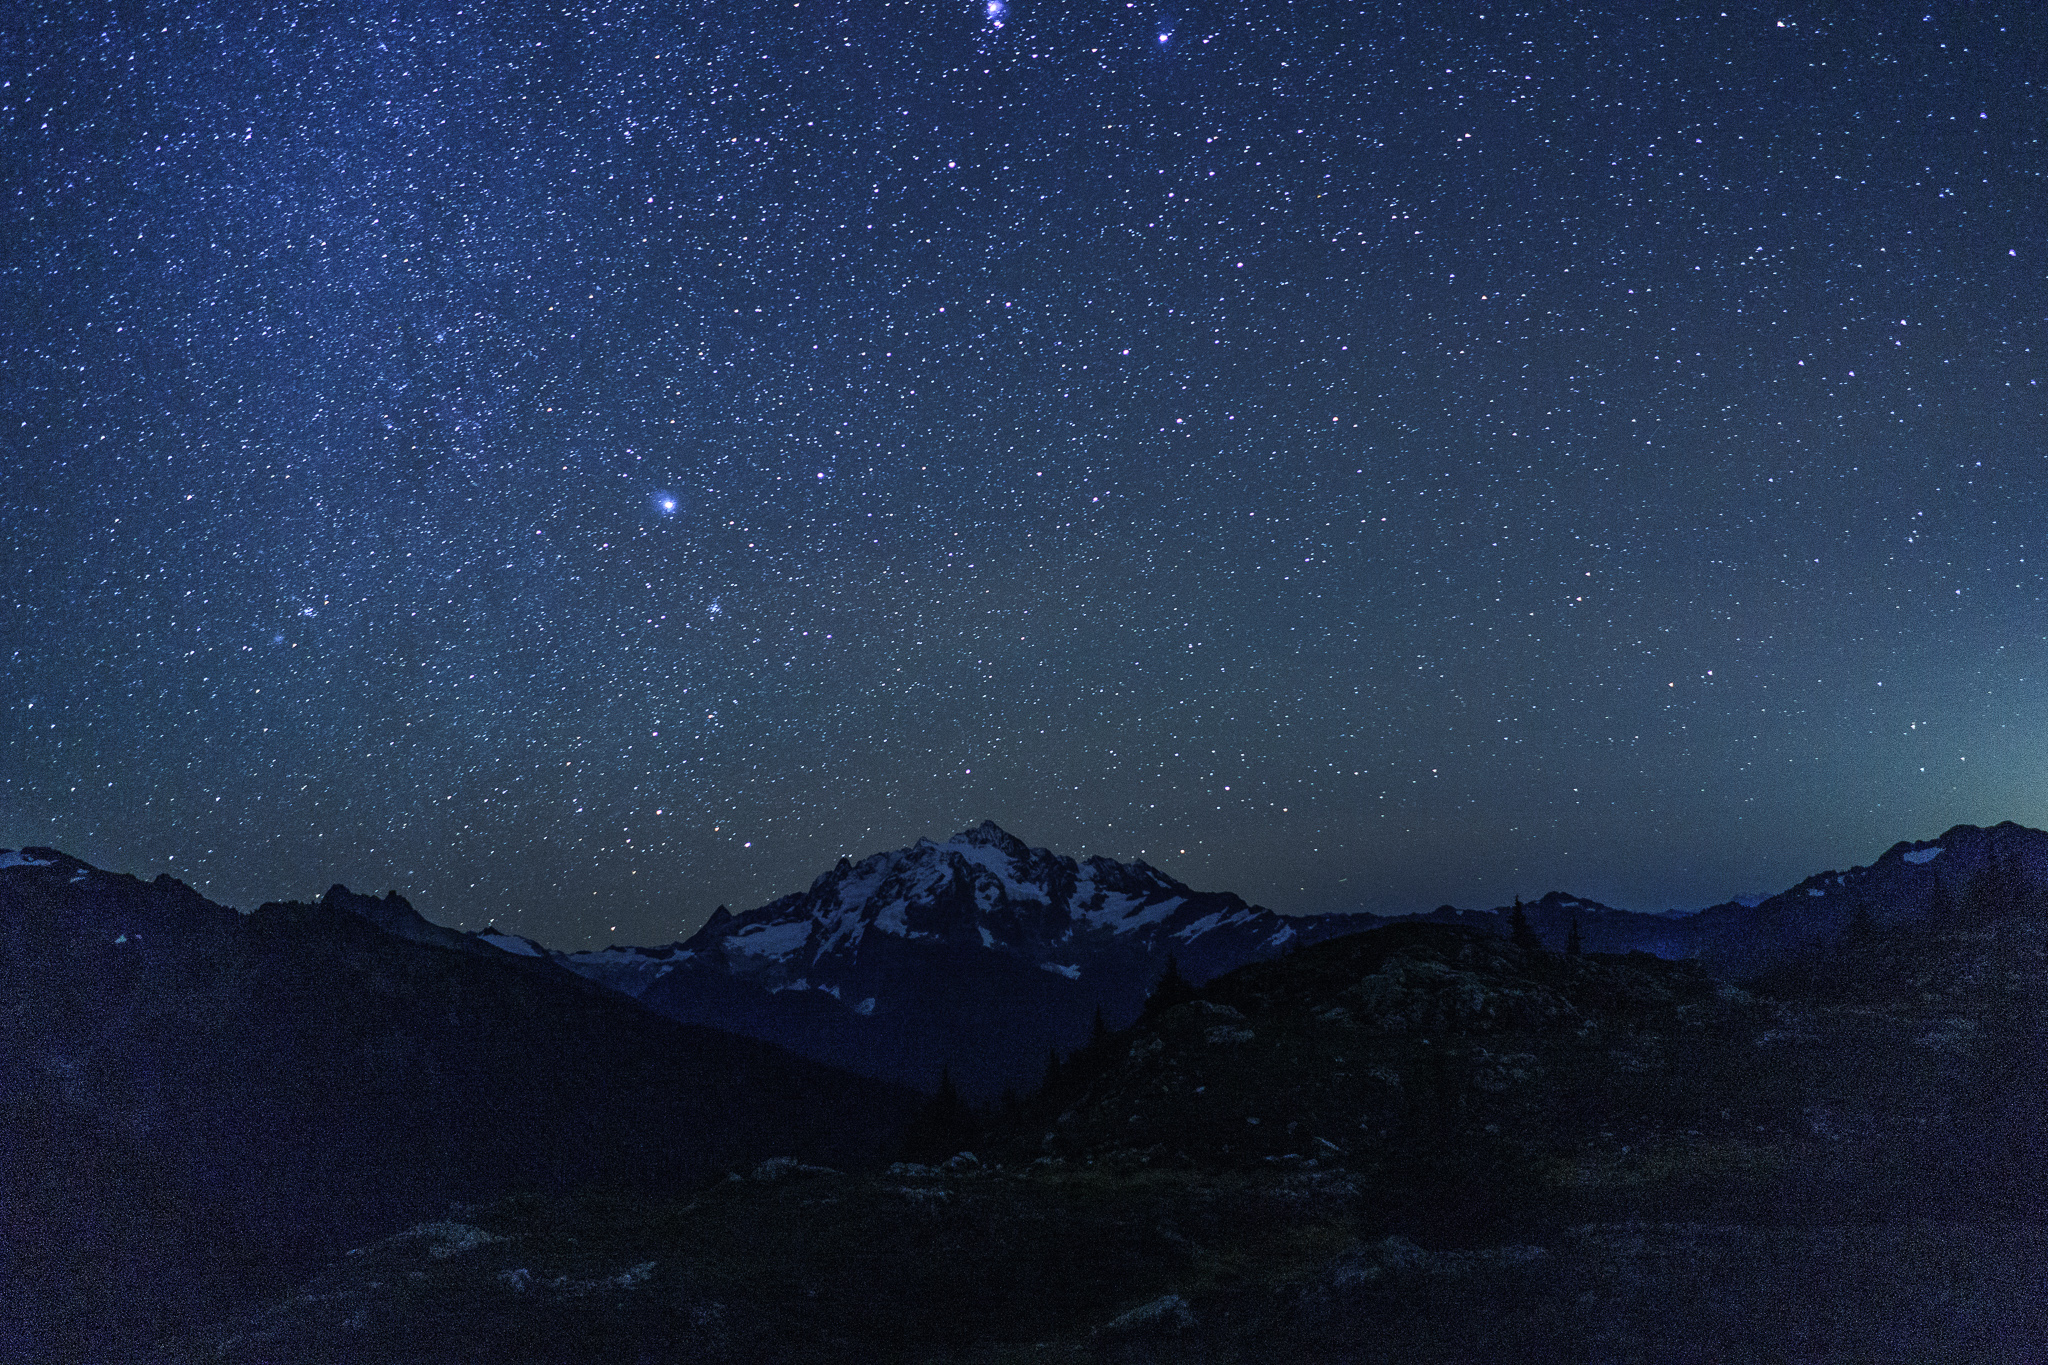 The stars were INSANE